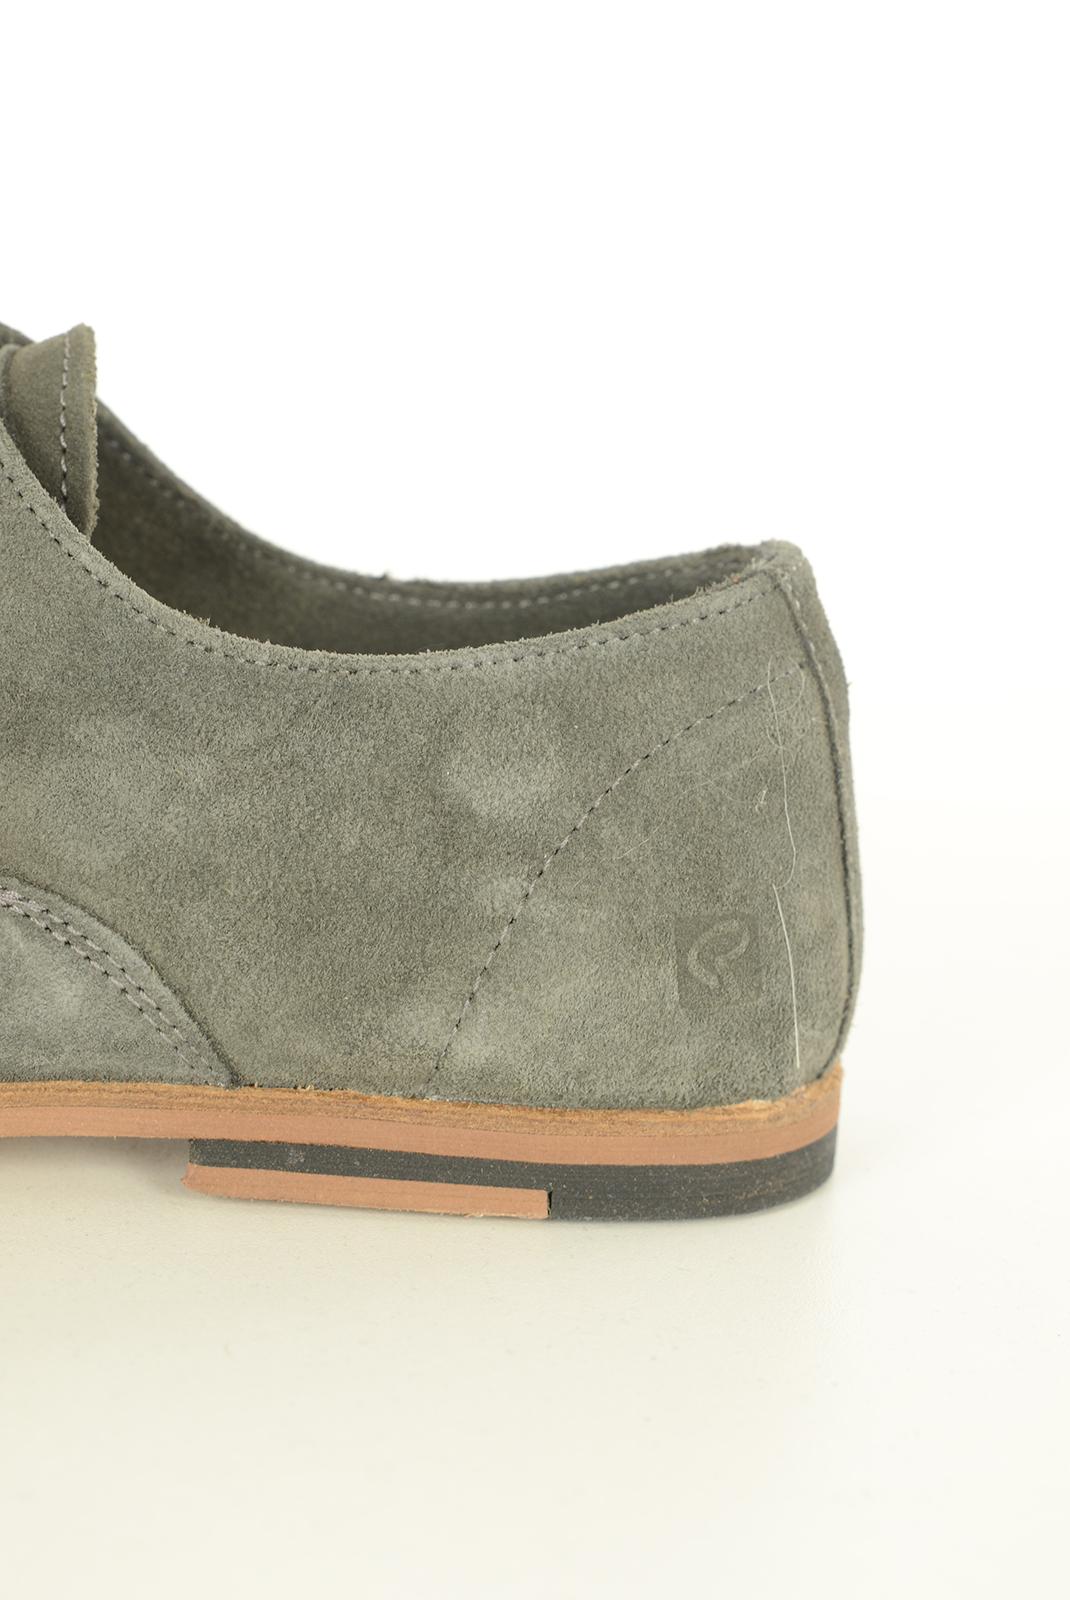 Chaussures de ville  Redskins WESSEL GRIS